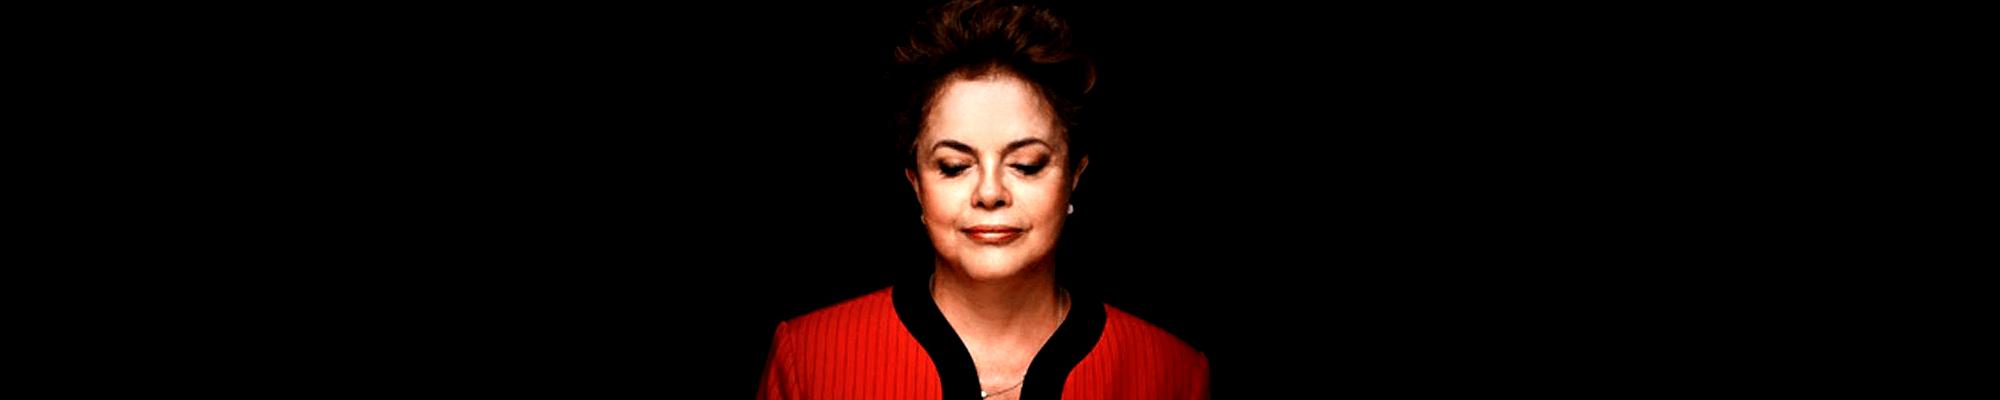 Carta aberta a Dilma Rousseff